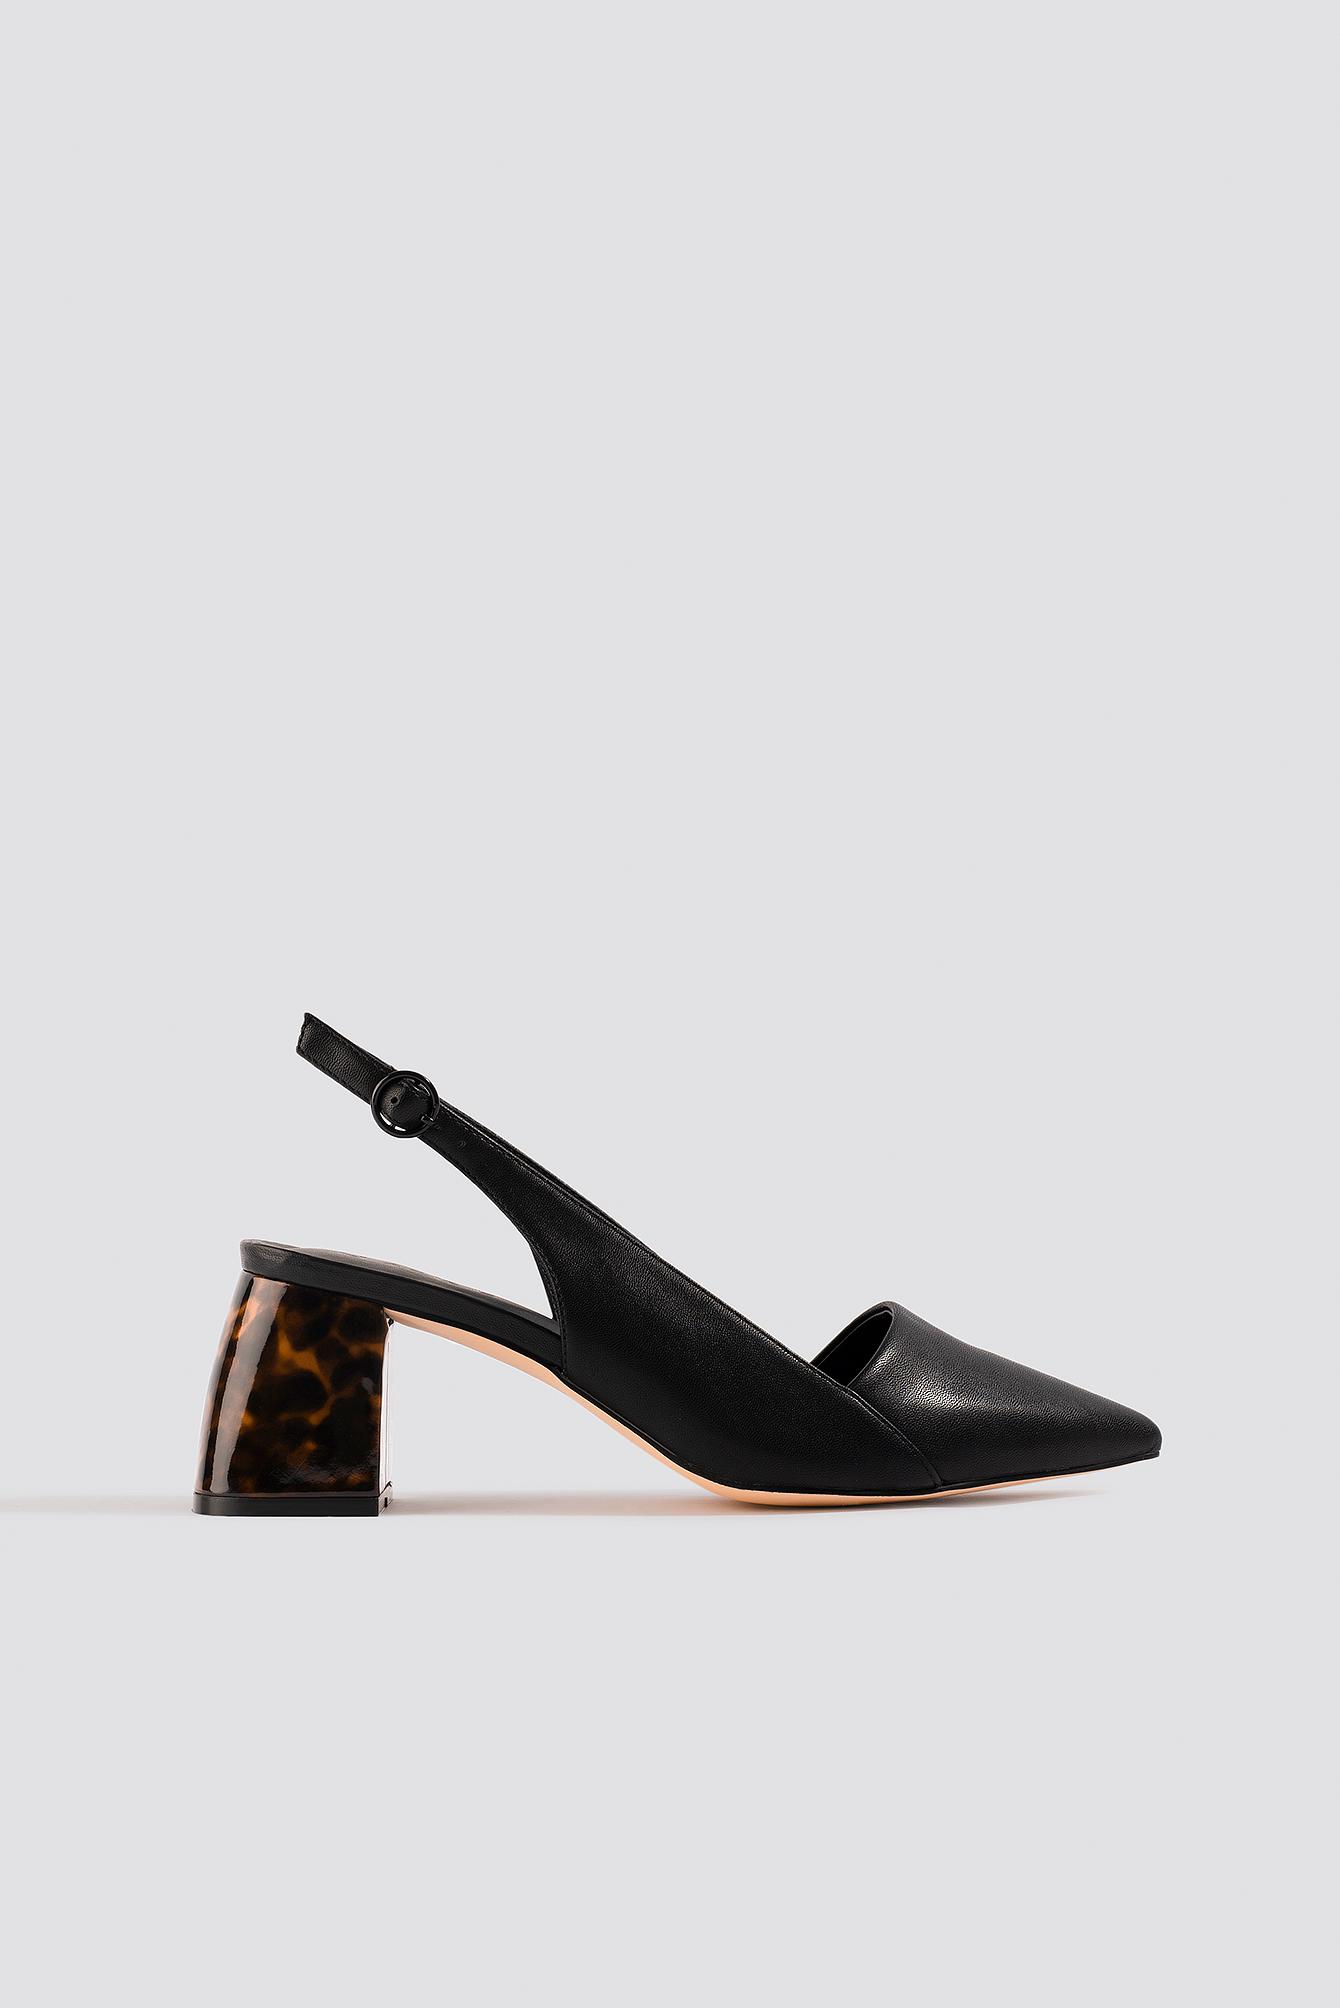 na-kd shoes -  Tortoise Heel Slingback Pumps - Black